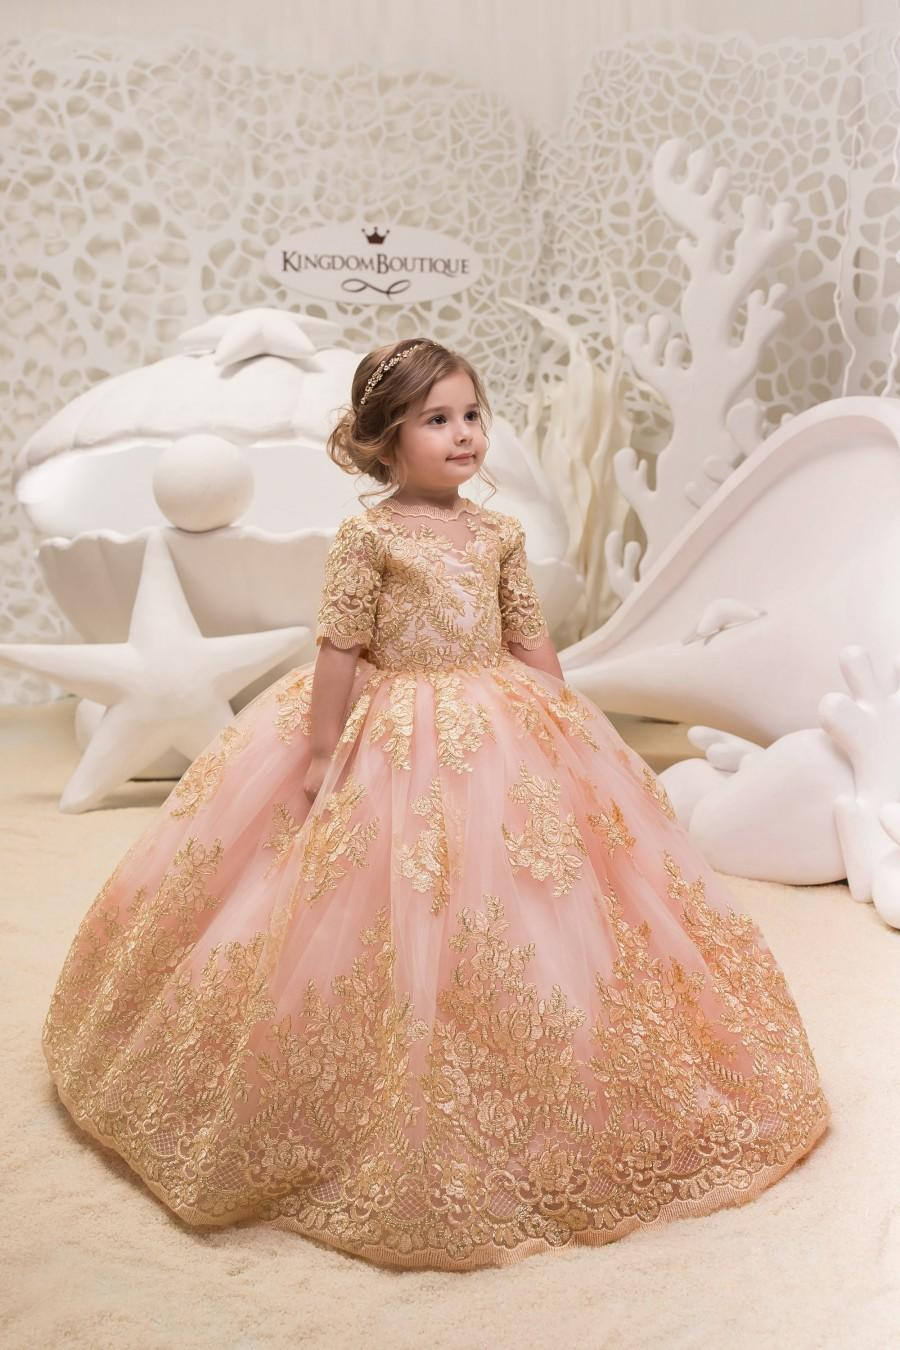 Wedding - Blush Pink and Gold Flower Girl Dress - Birthday Wedding Party Holiday Bridesmaid Flower Girl Blush Pink and Gold Tulle Lace Dress 21-061